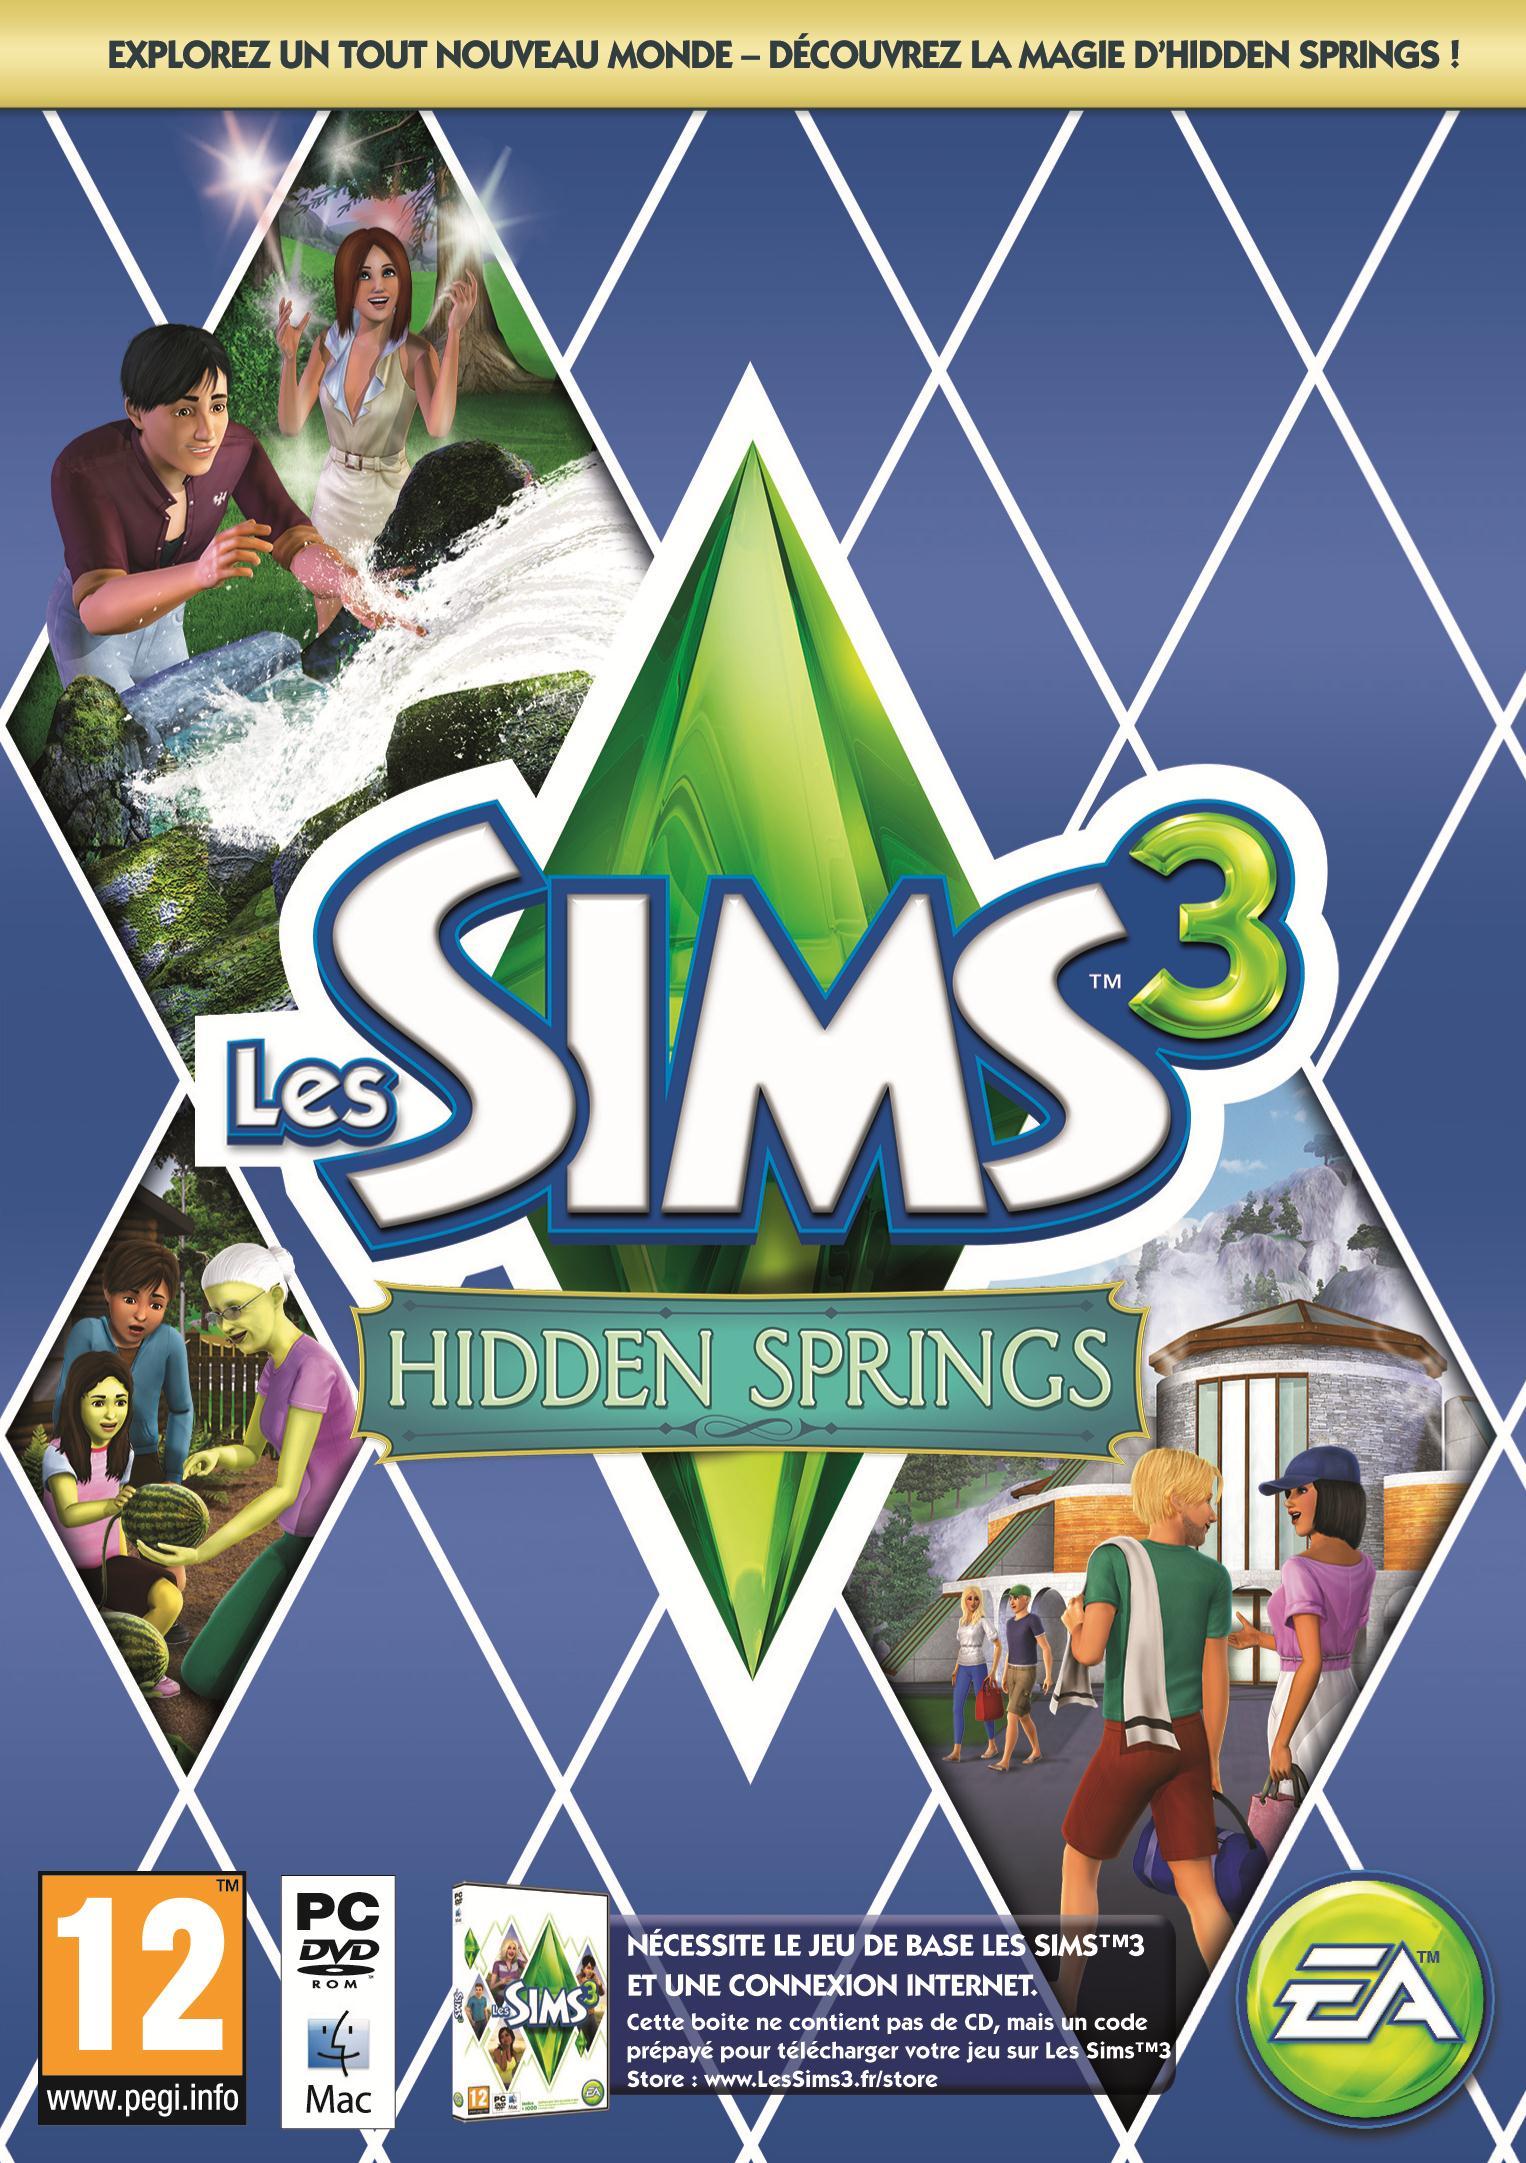 Les Sims 3: Hidden Springs